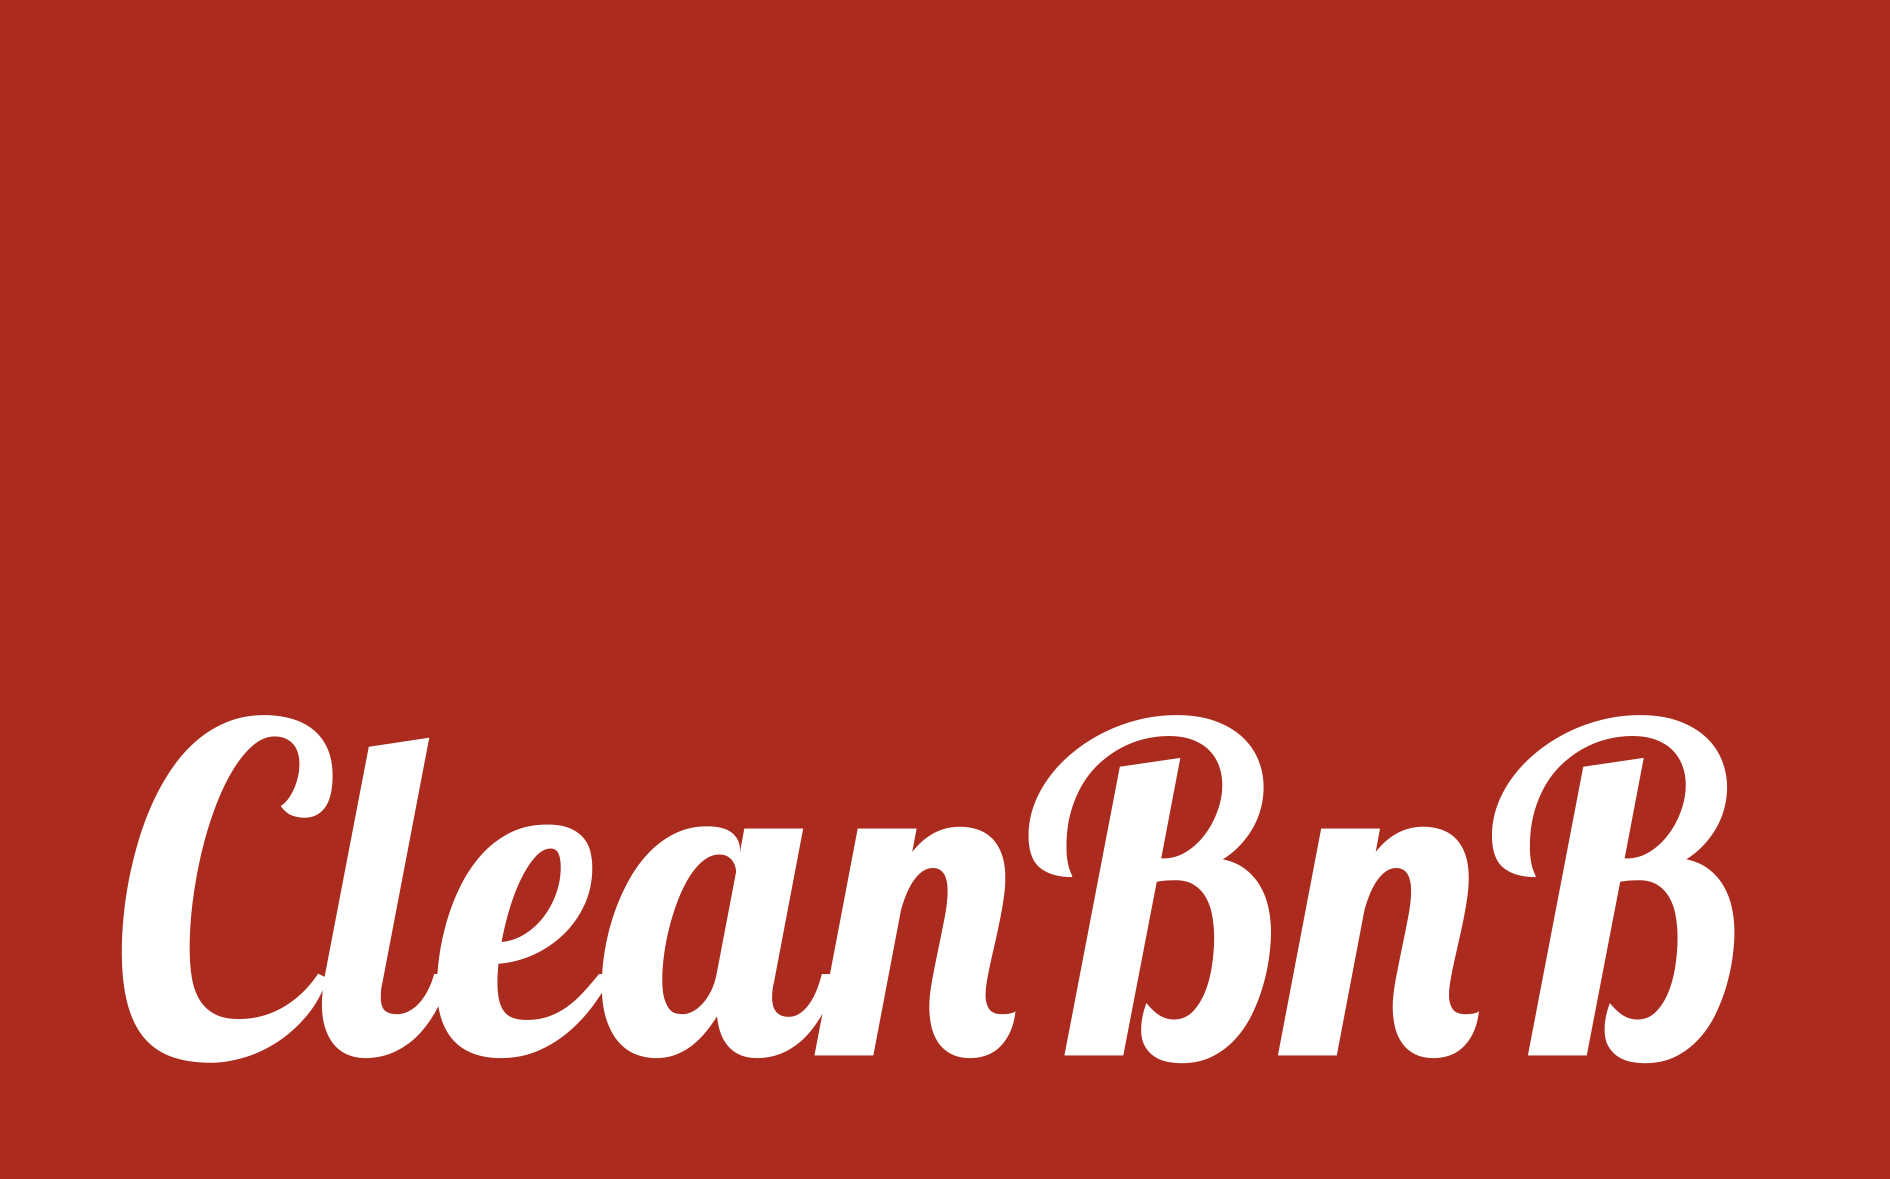 cleanbnb